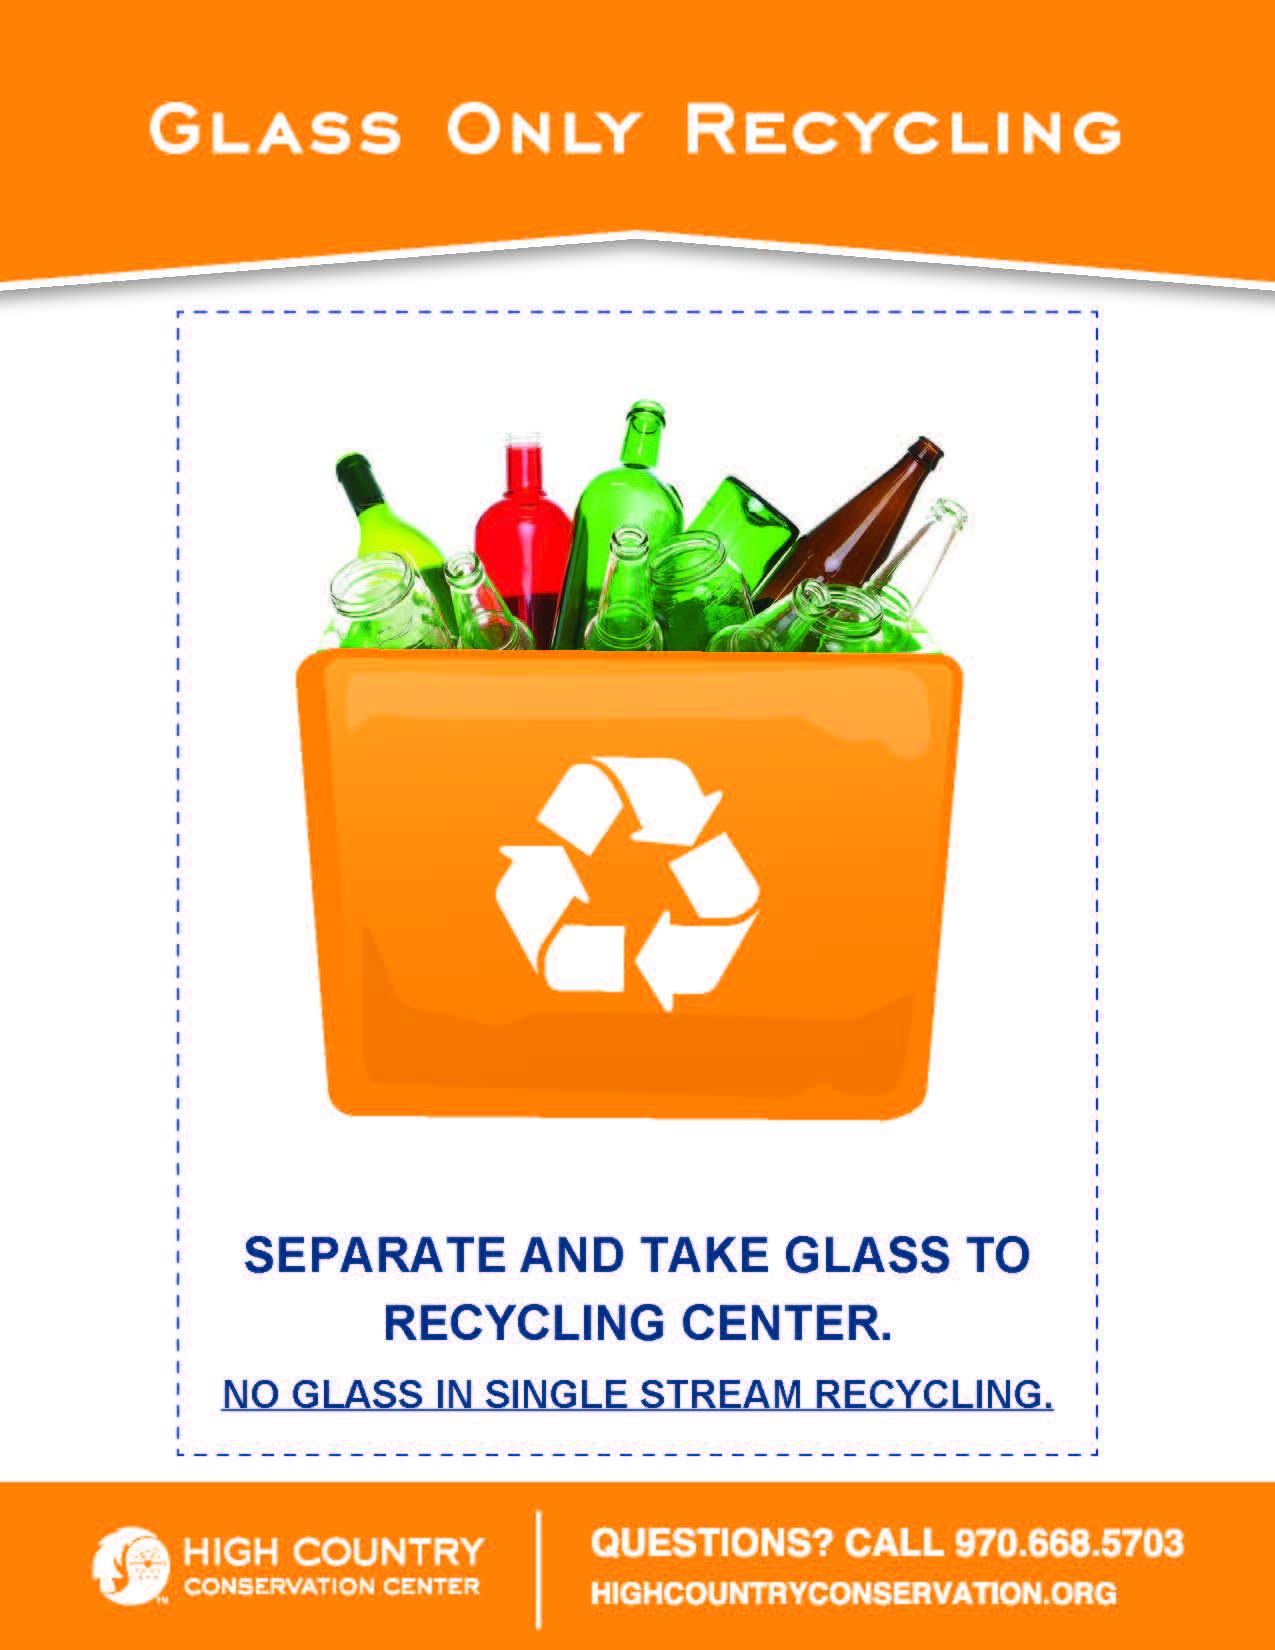 Information describing glass recycling